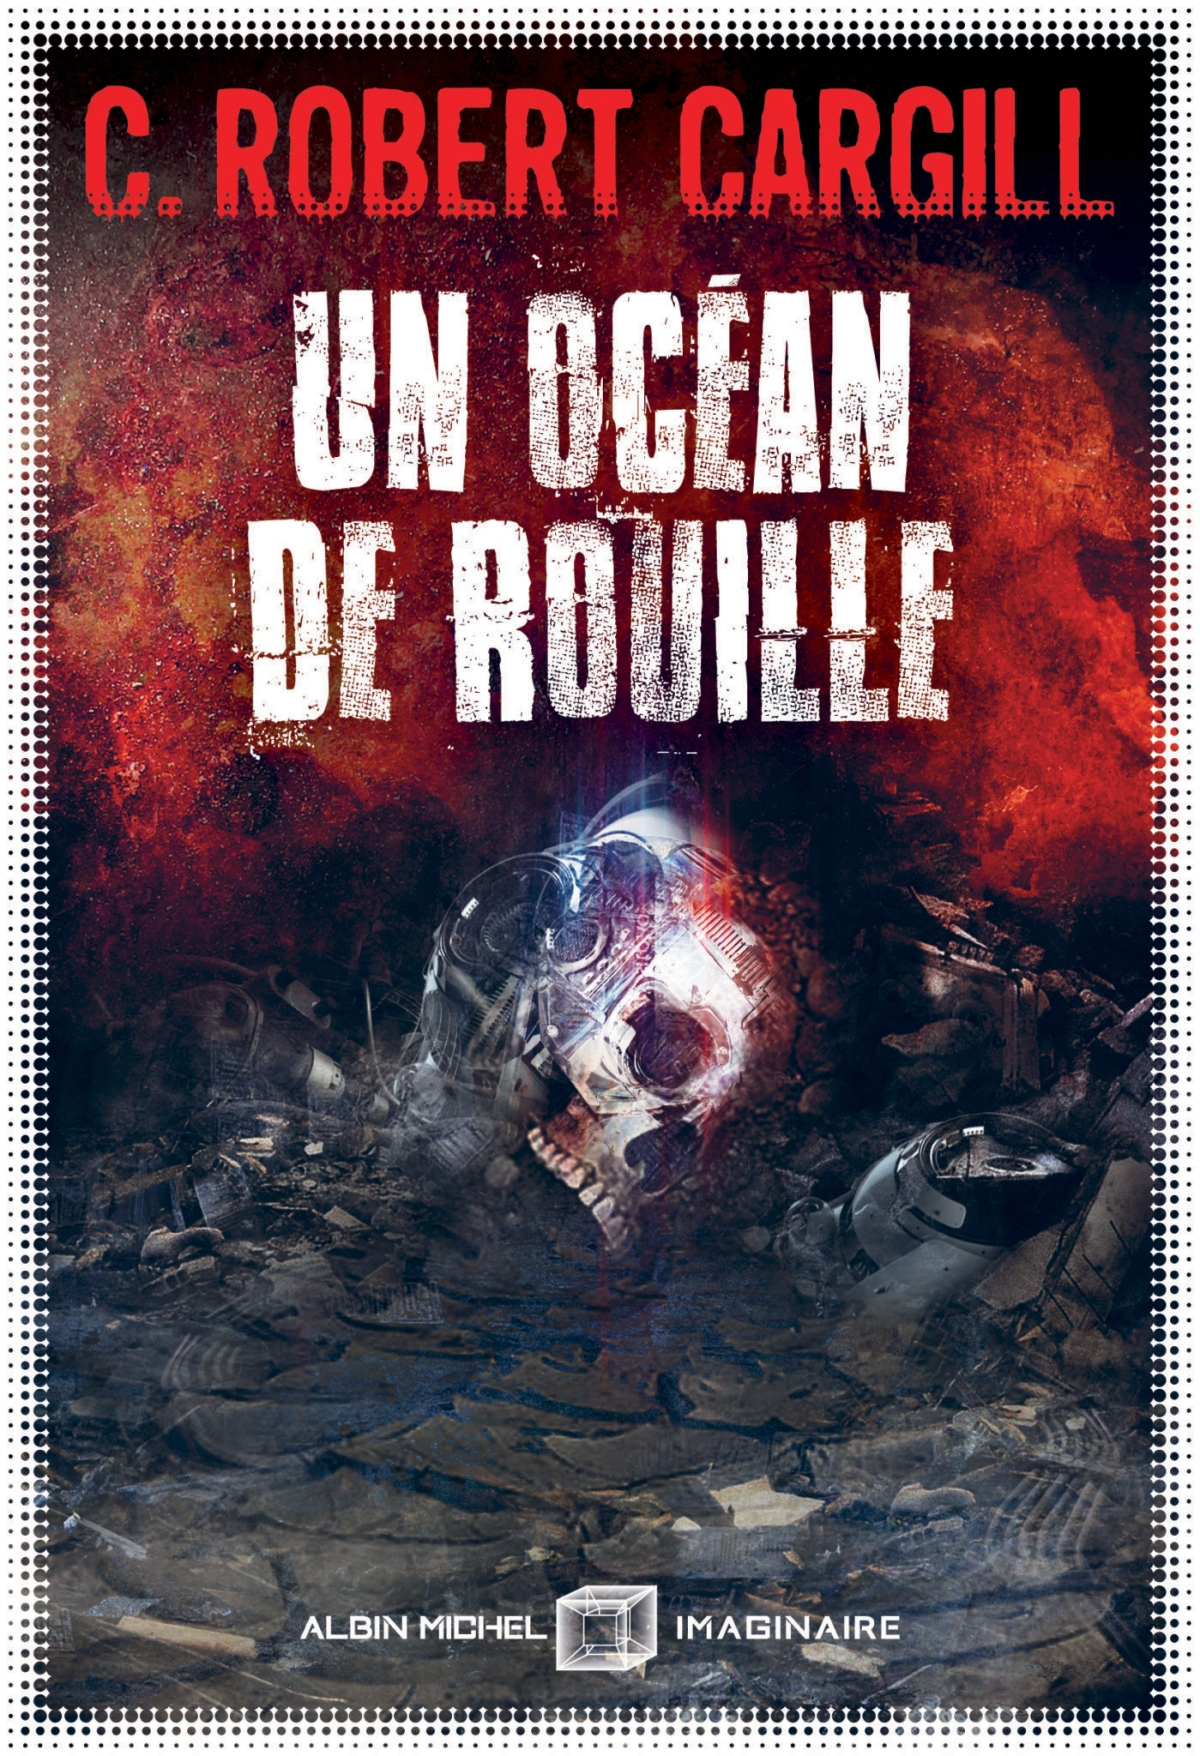 Revue Littéraire : Océan de Rouille de Robert C.Cargill